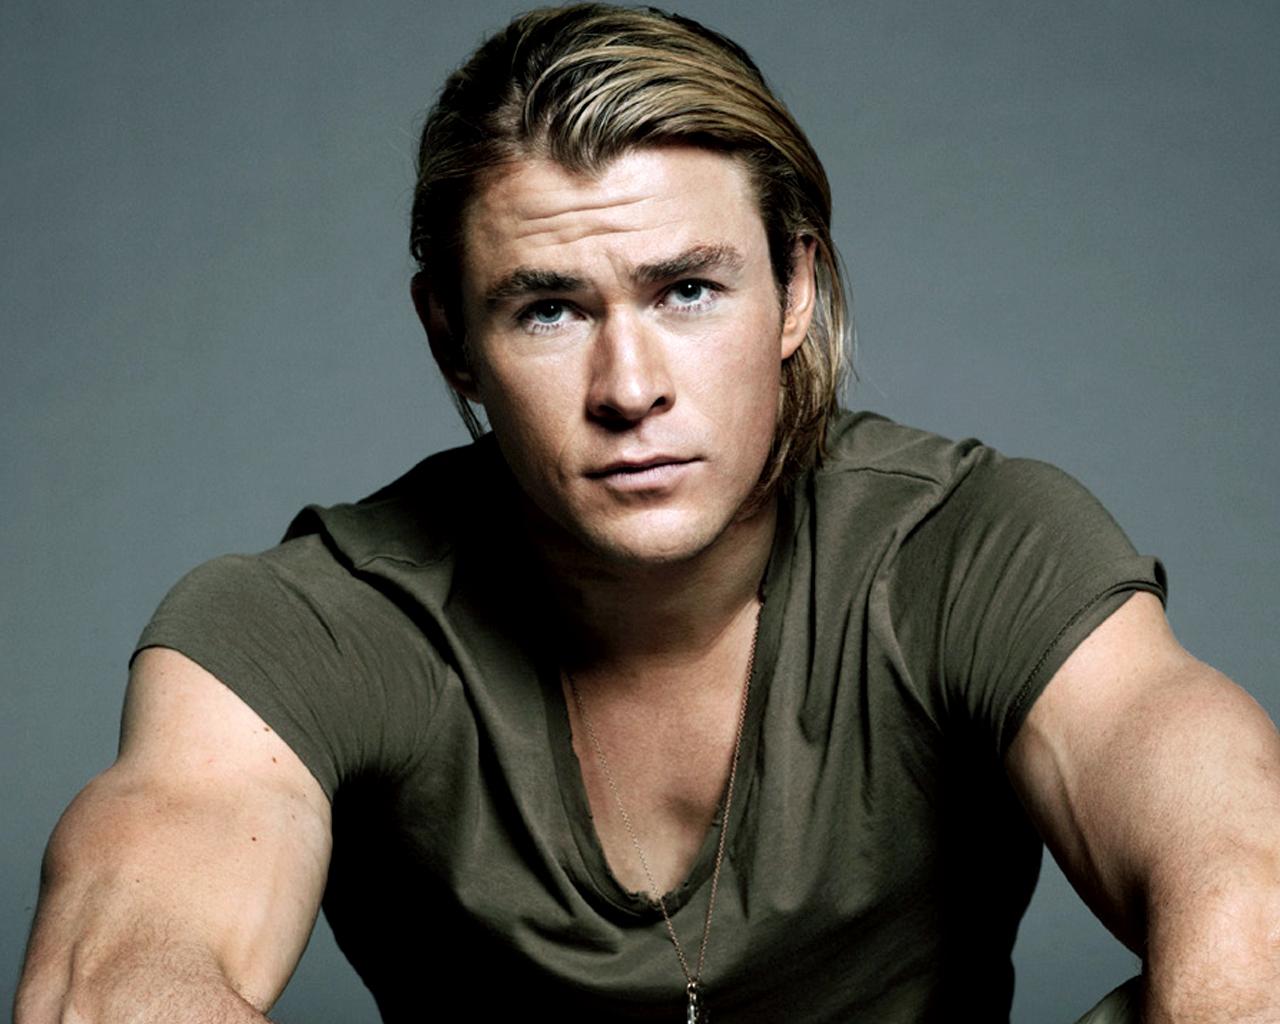 Chris Hemsworth moda masculina alexandre taleb style male - Estilo celebridade: Christopher Hemsworth